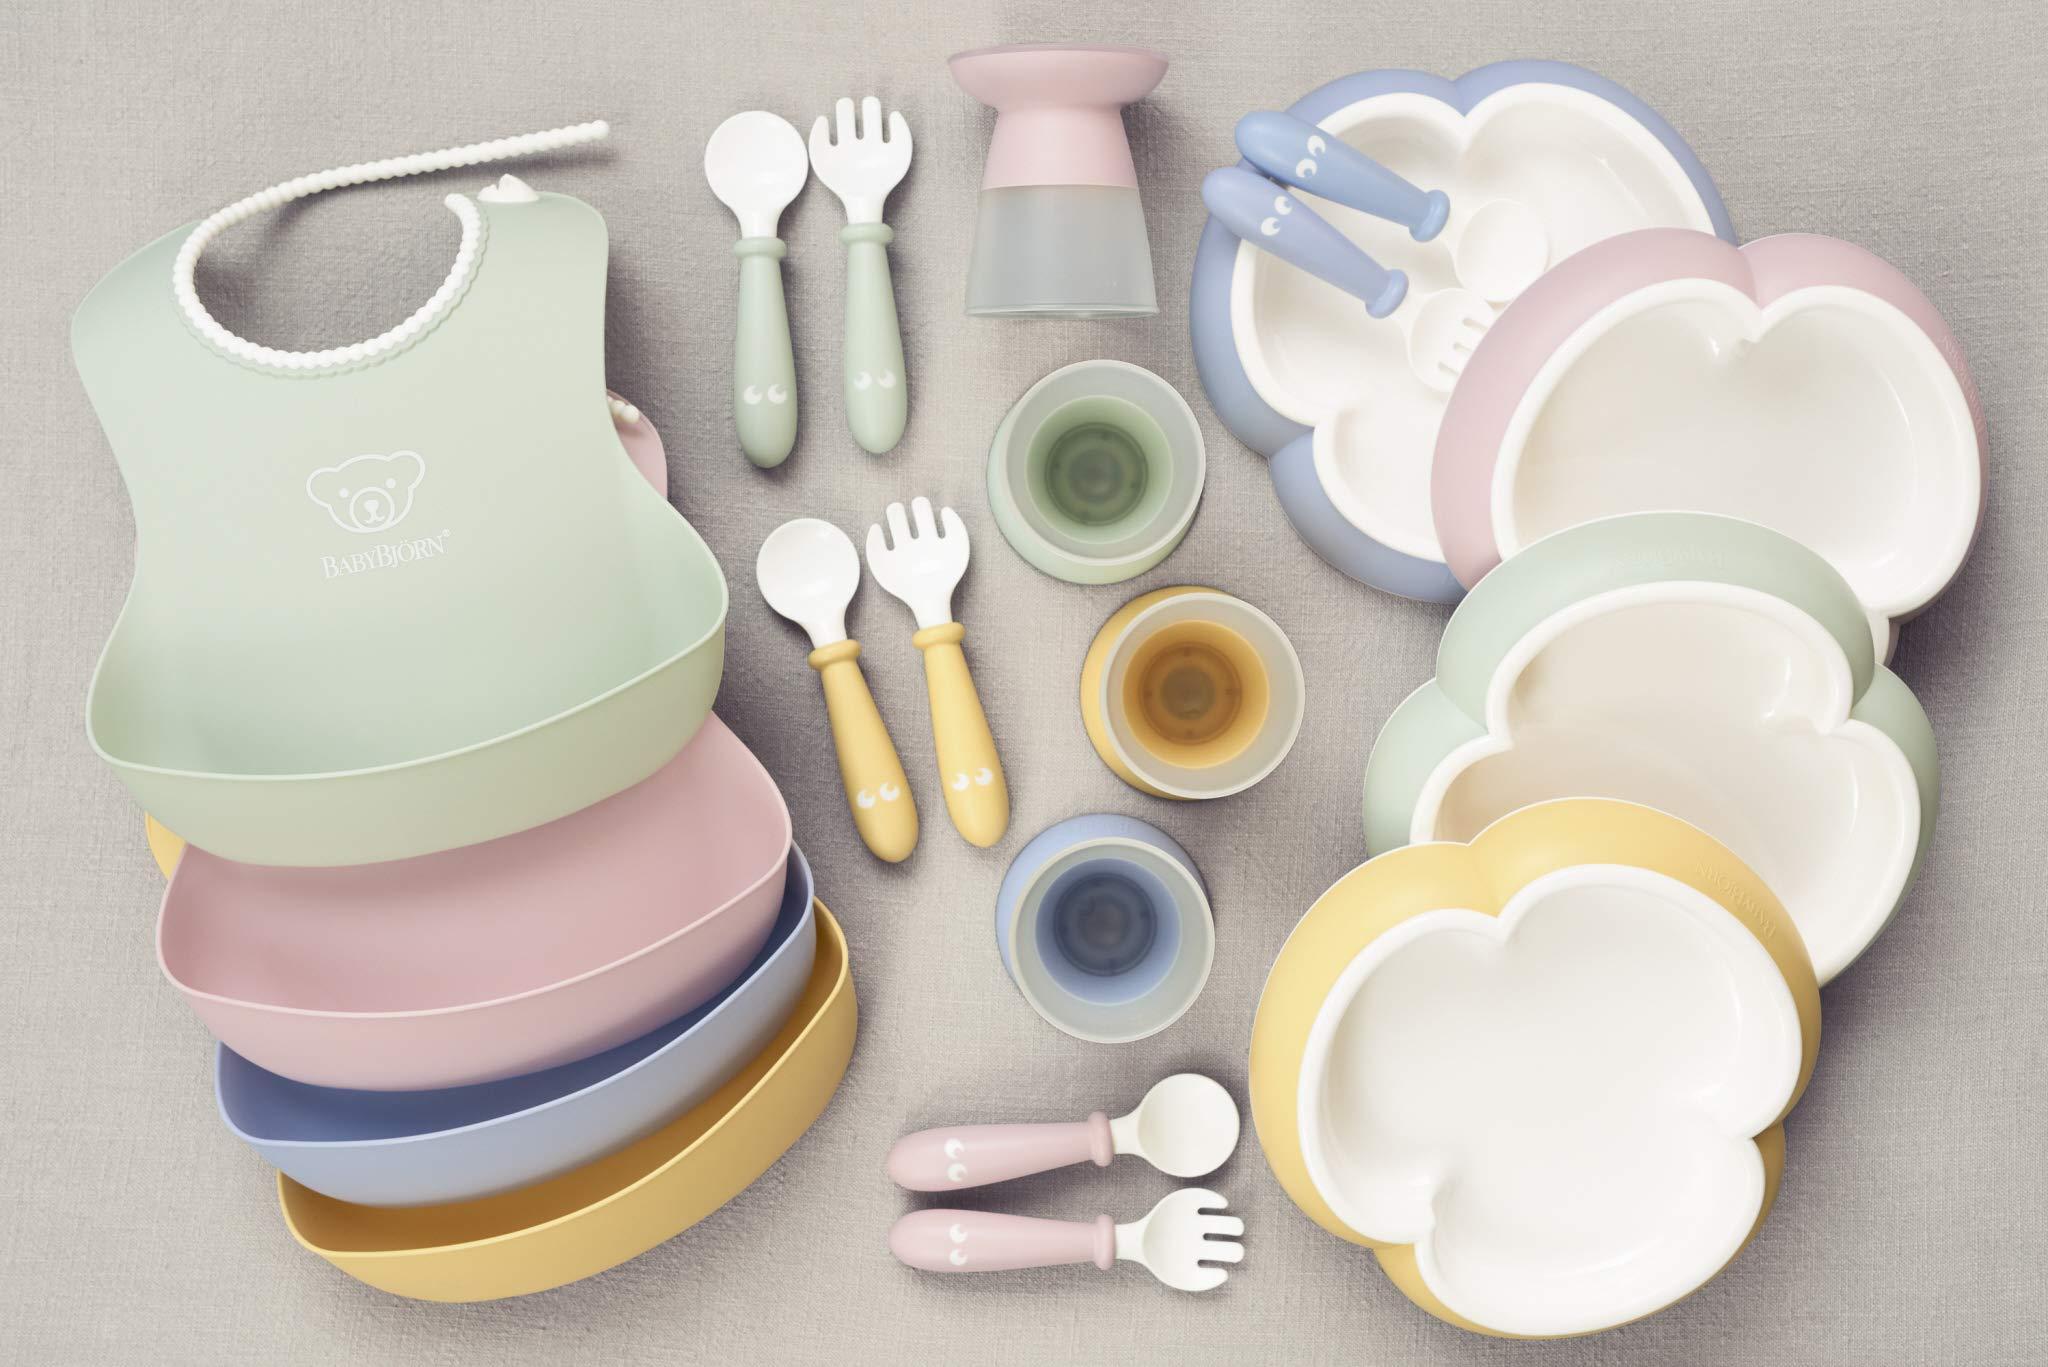 BABYBJORN Baby Dinner Set, Powder Pink by BabyBjörn (Image #10)